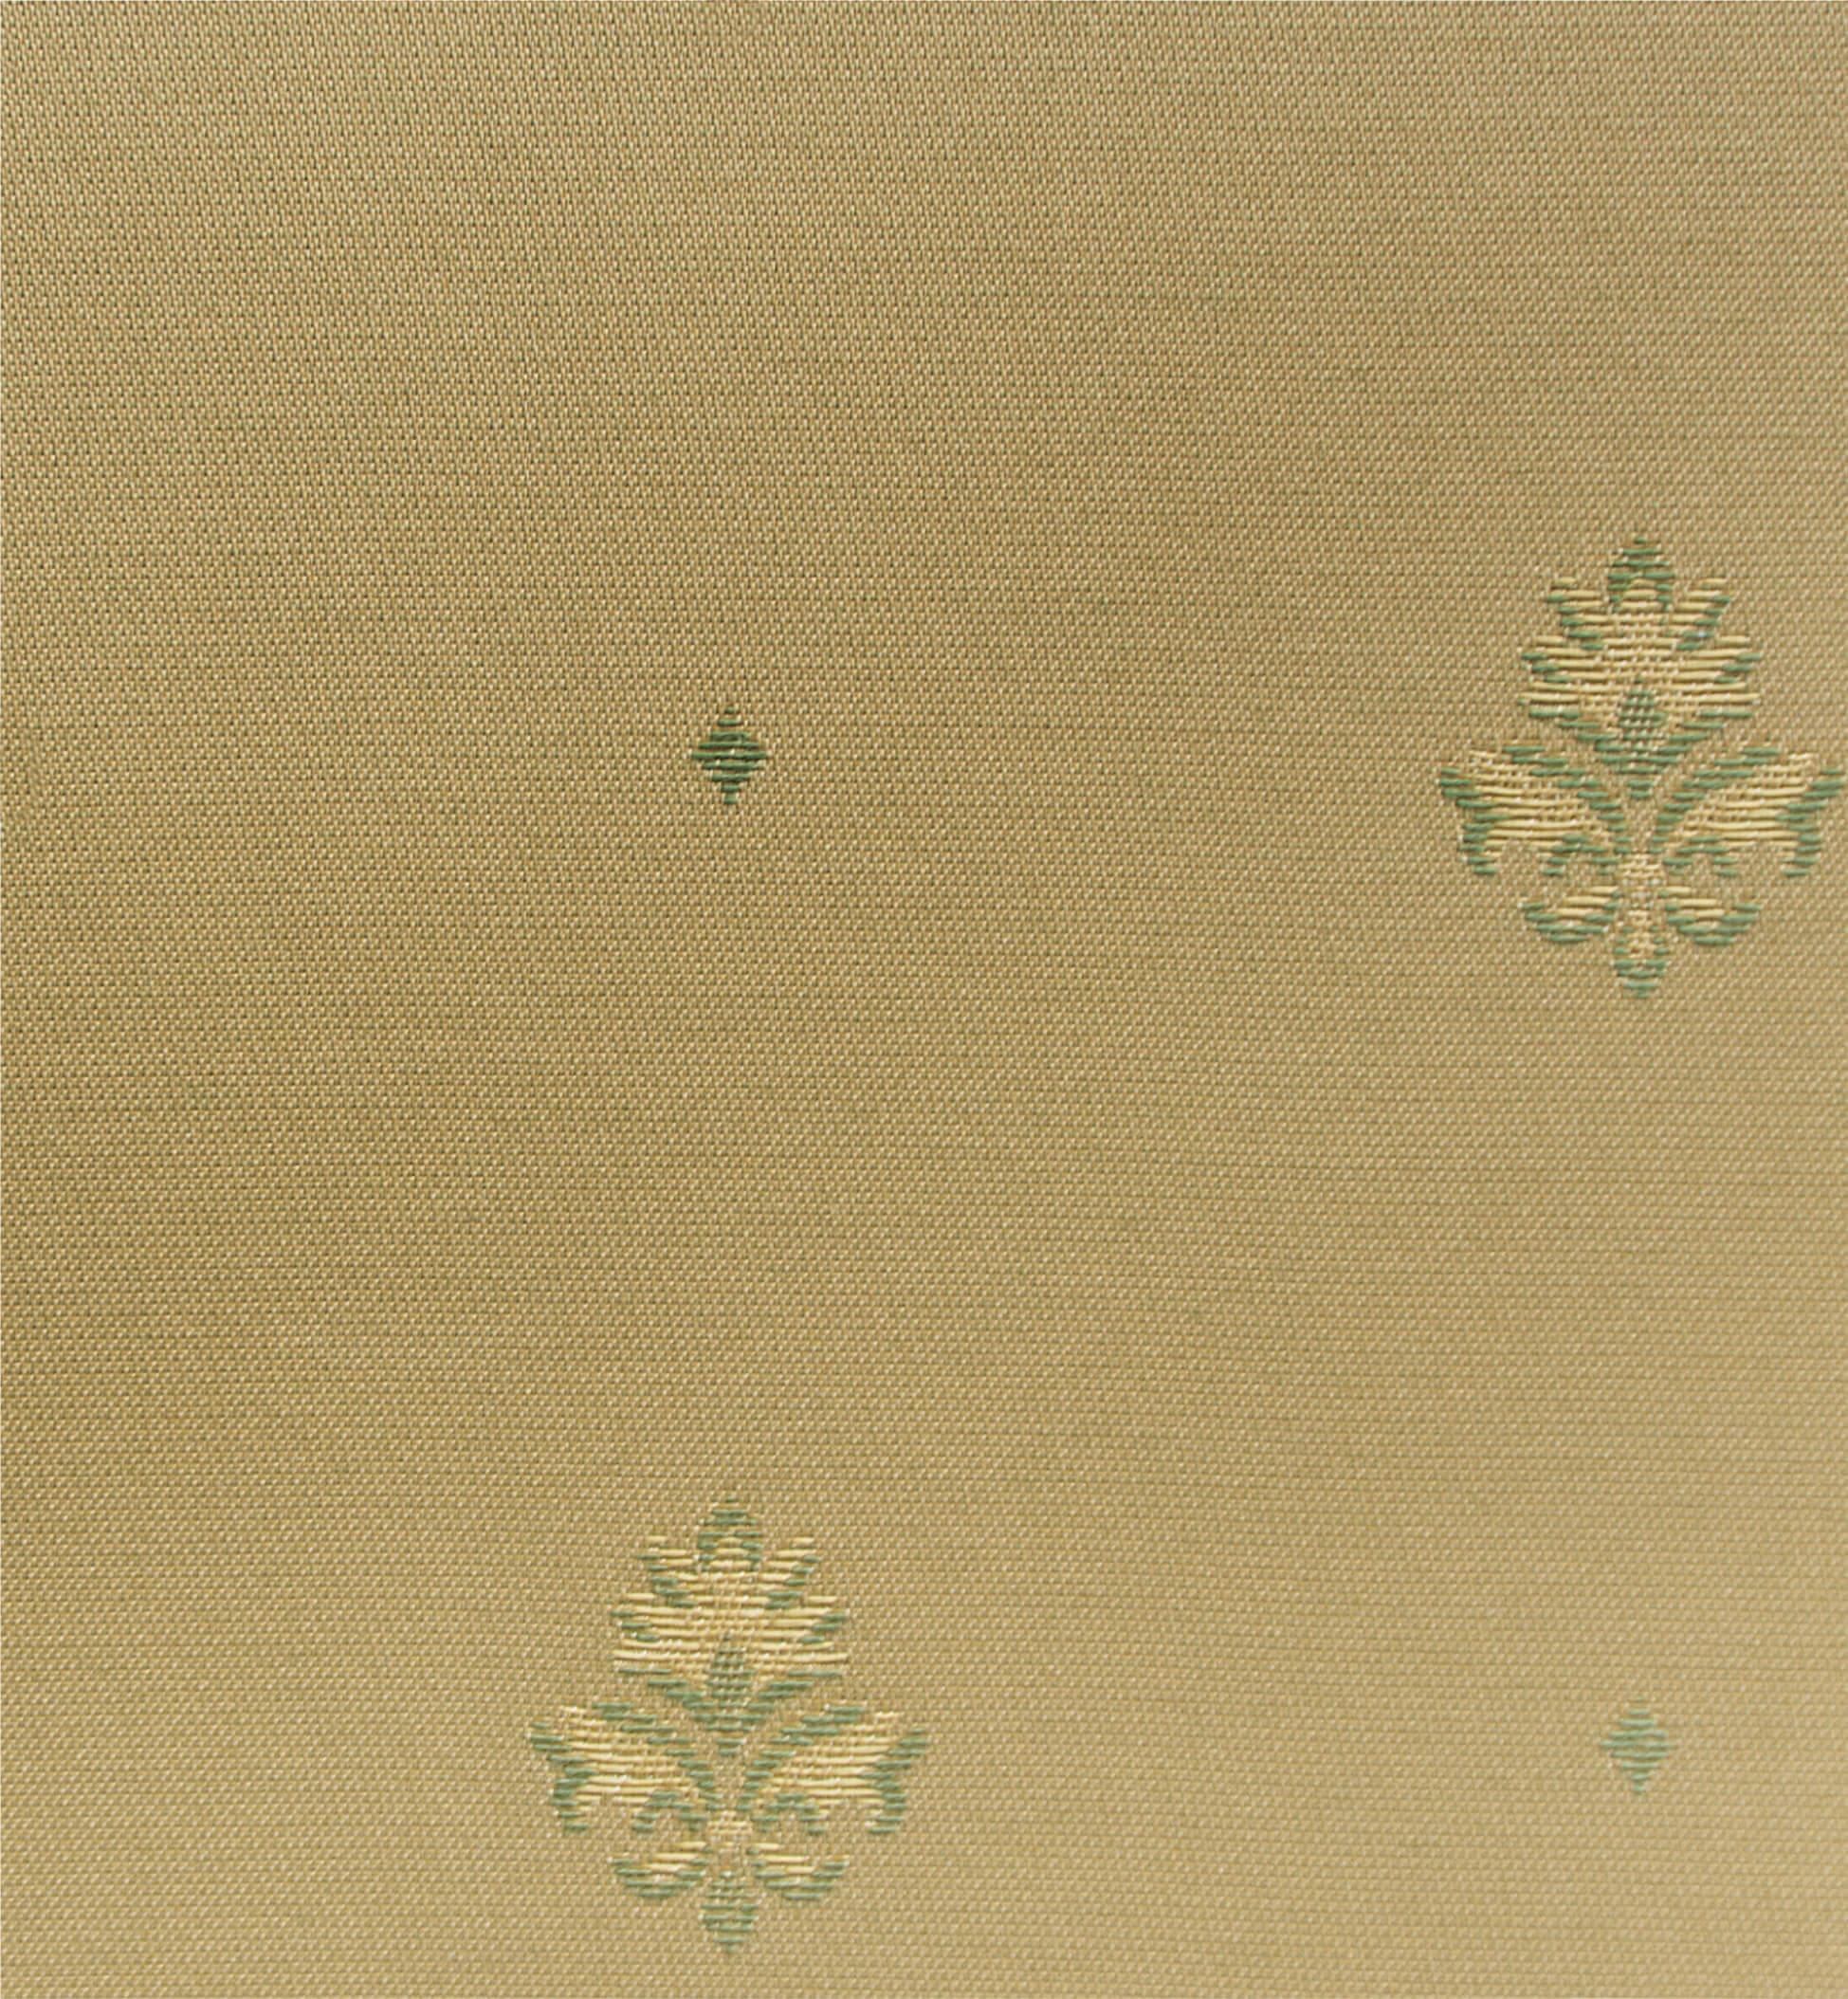 Итальянские обои Giardini,  коллекция Savoy, артикулSV53